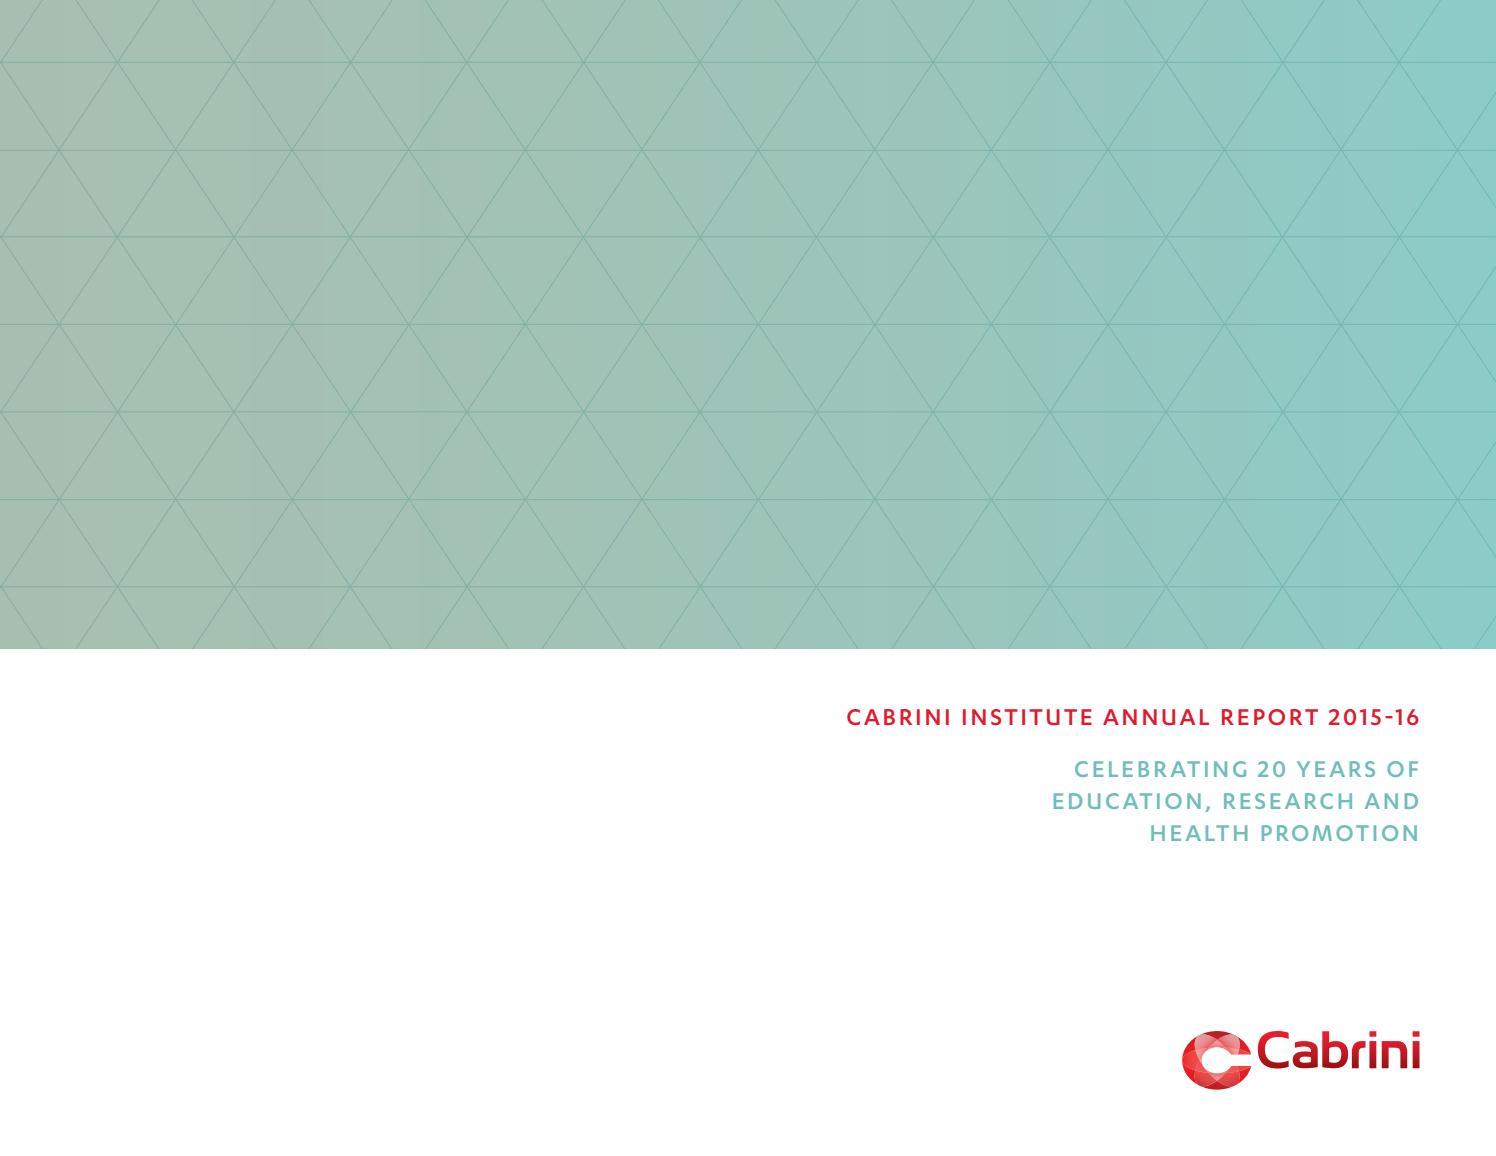 Cabrini institute annual report 2015 16 by cabrini health issuu